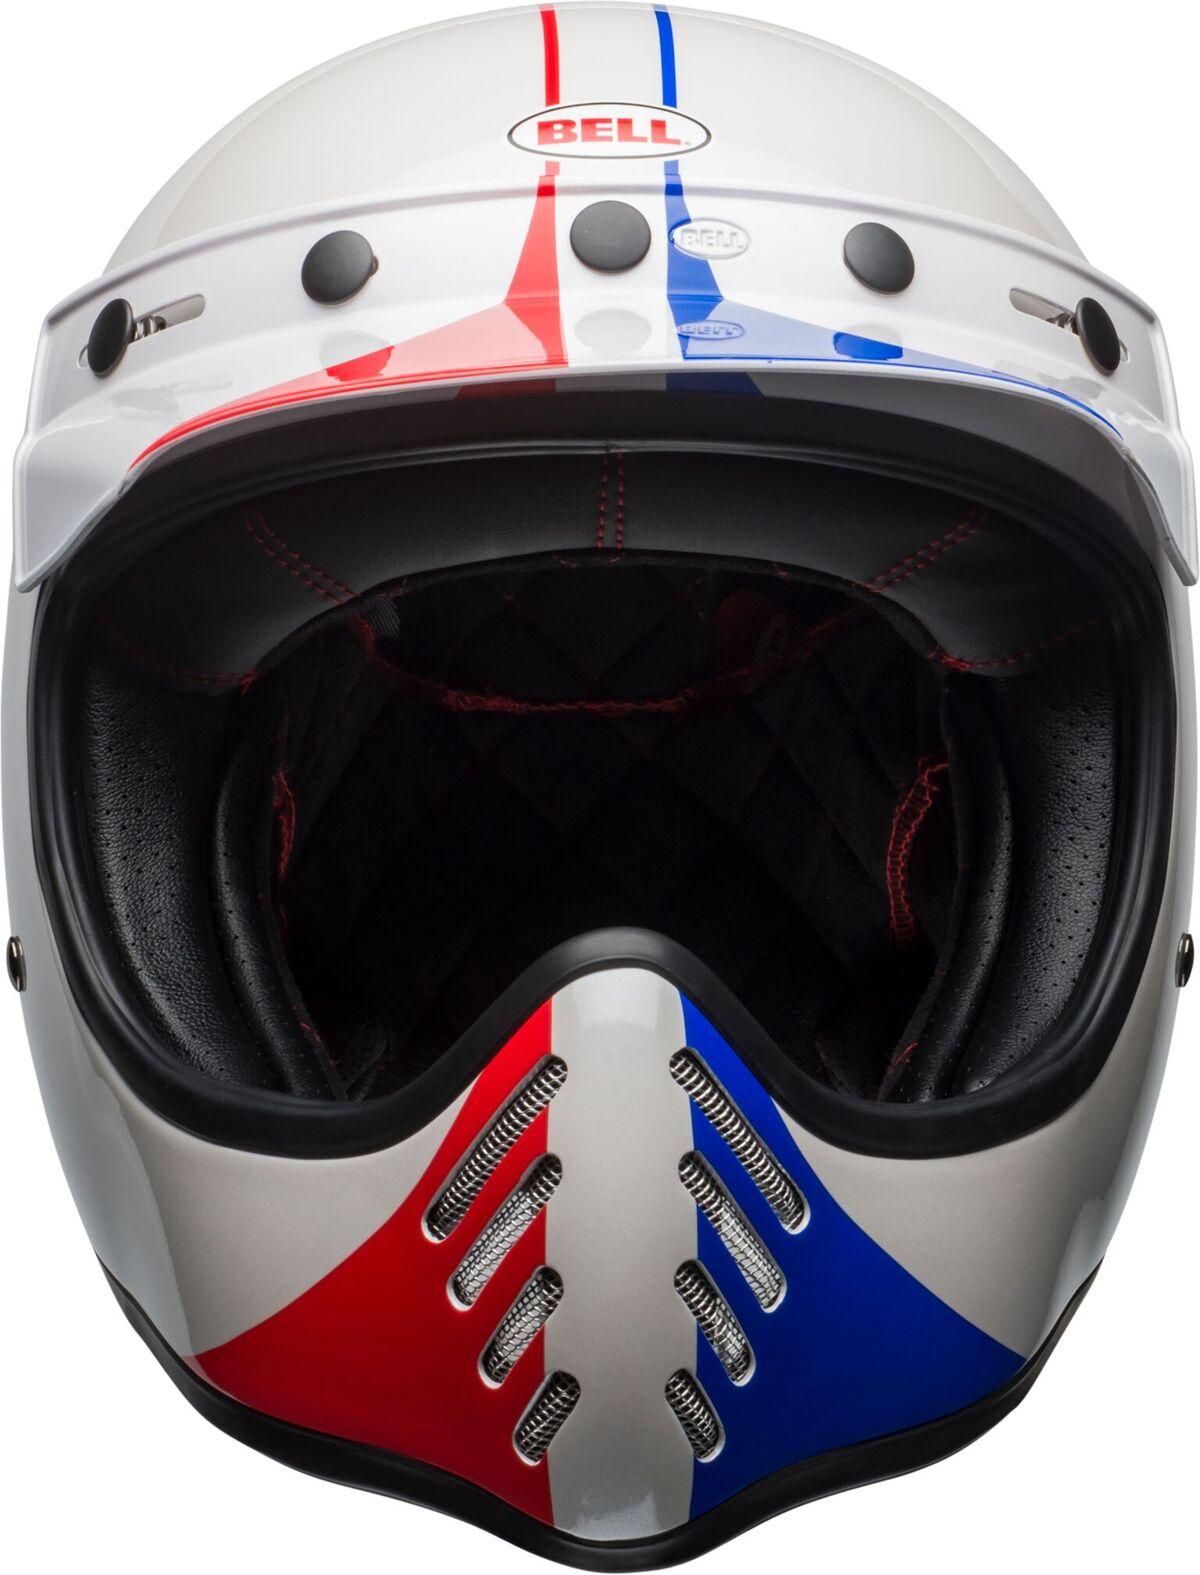 Bell Helmets Unveils New 80th Anniversary Ace Café ...